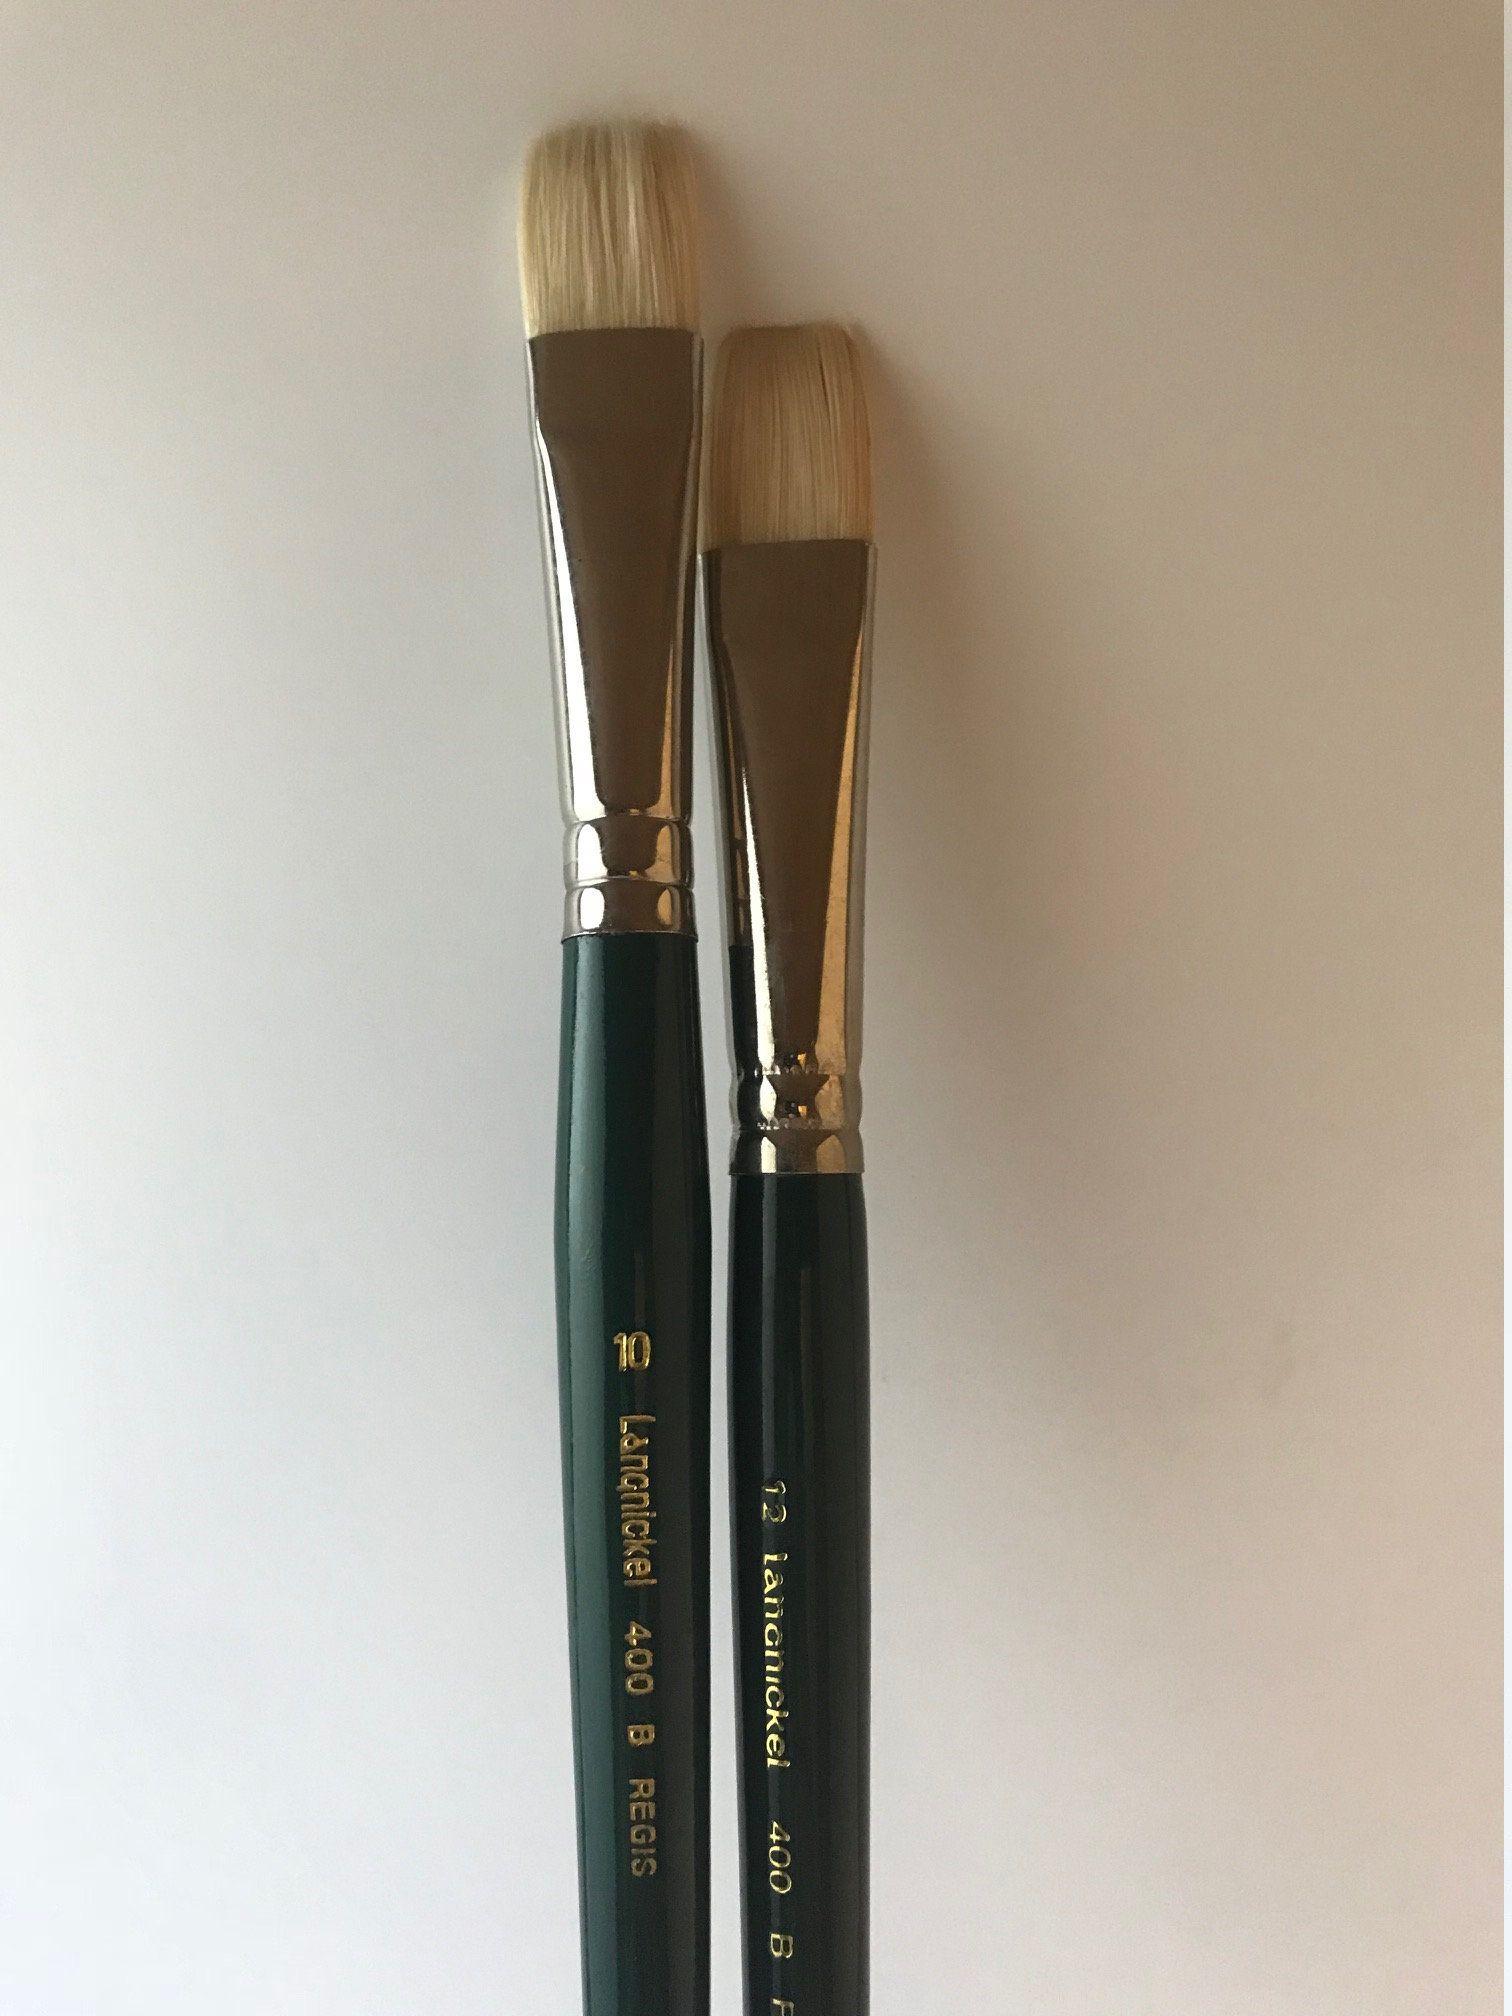 Regis Bristle Brush Set Langnickel 400b Artist Pail Brushes Oil Paint Brushes Acrylic Paint Brushes F Oil Paint Brushes Acrylic Paint Brushes Artist Gifts